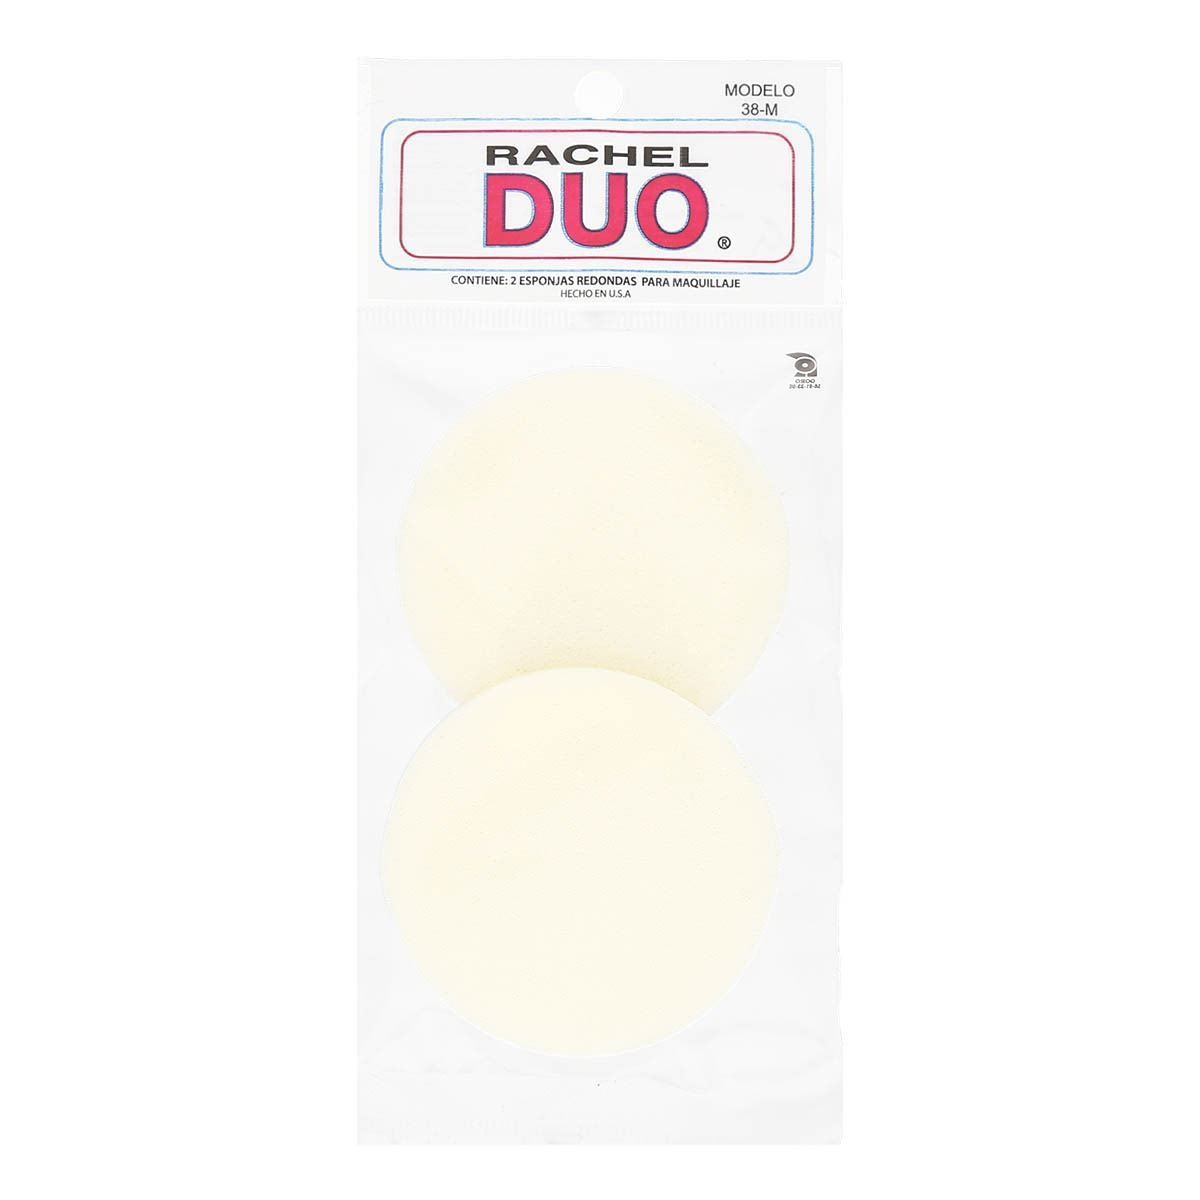 Esponjas redondas maquillaje Rachel Duo 38-M